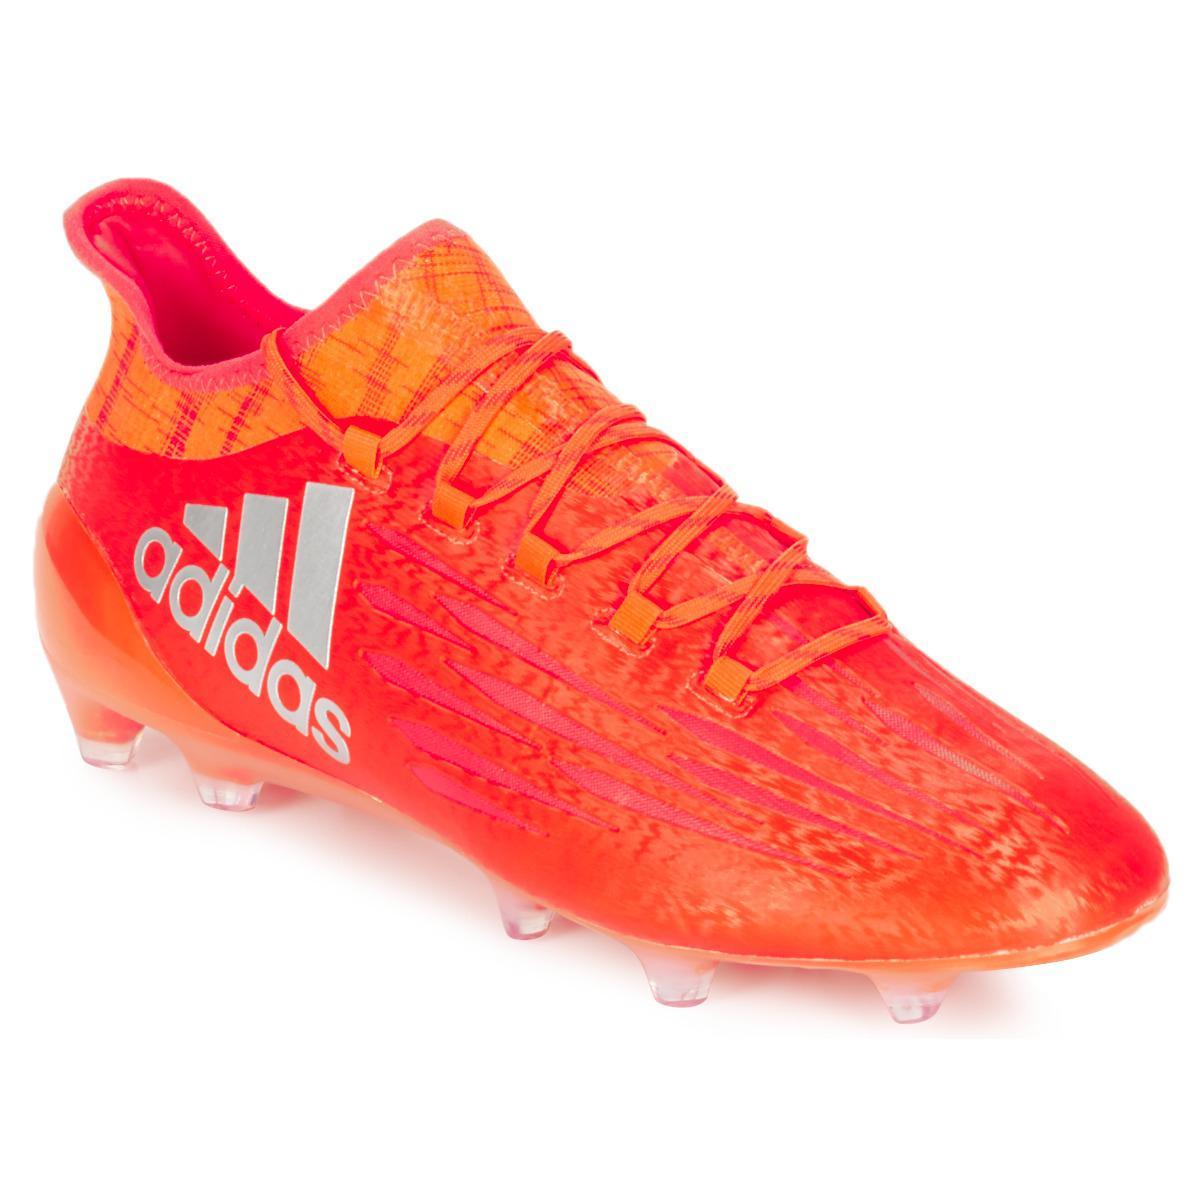 size 40 04e87 a2508 adidas. X 16.1 Fg Men s Football Boots In Orange